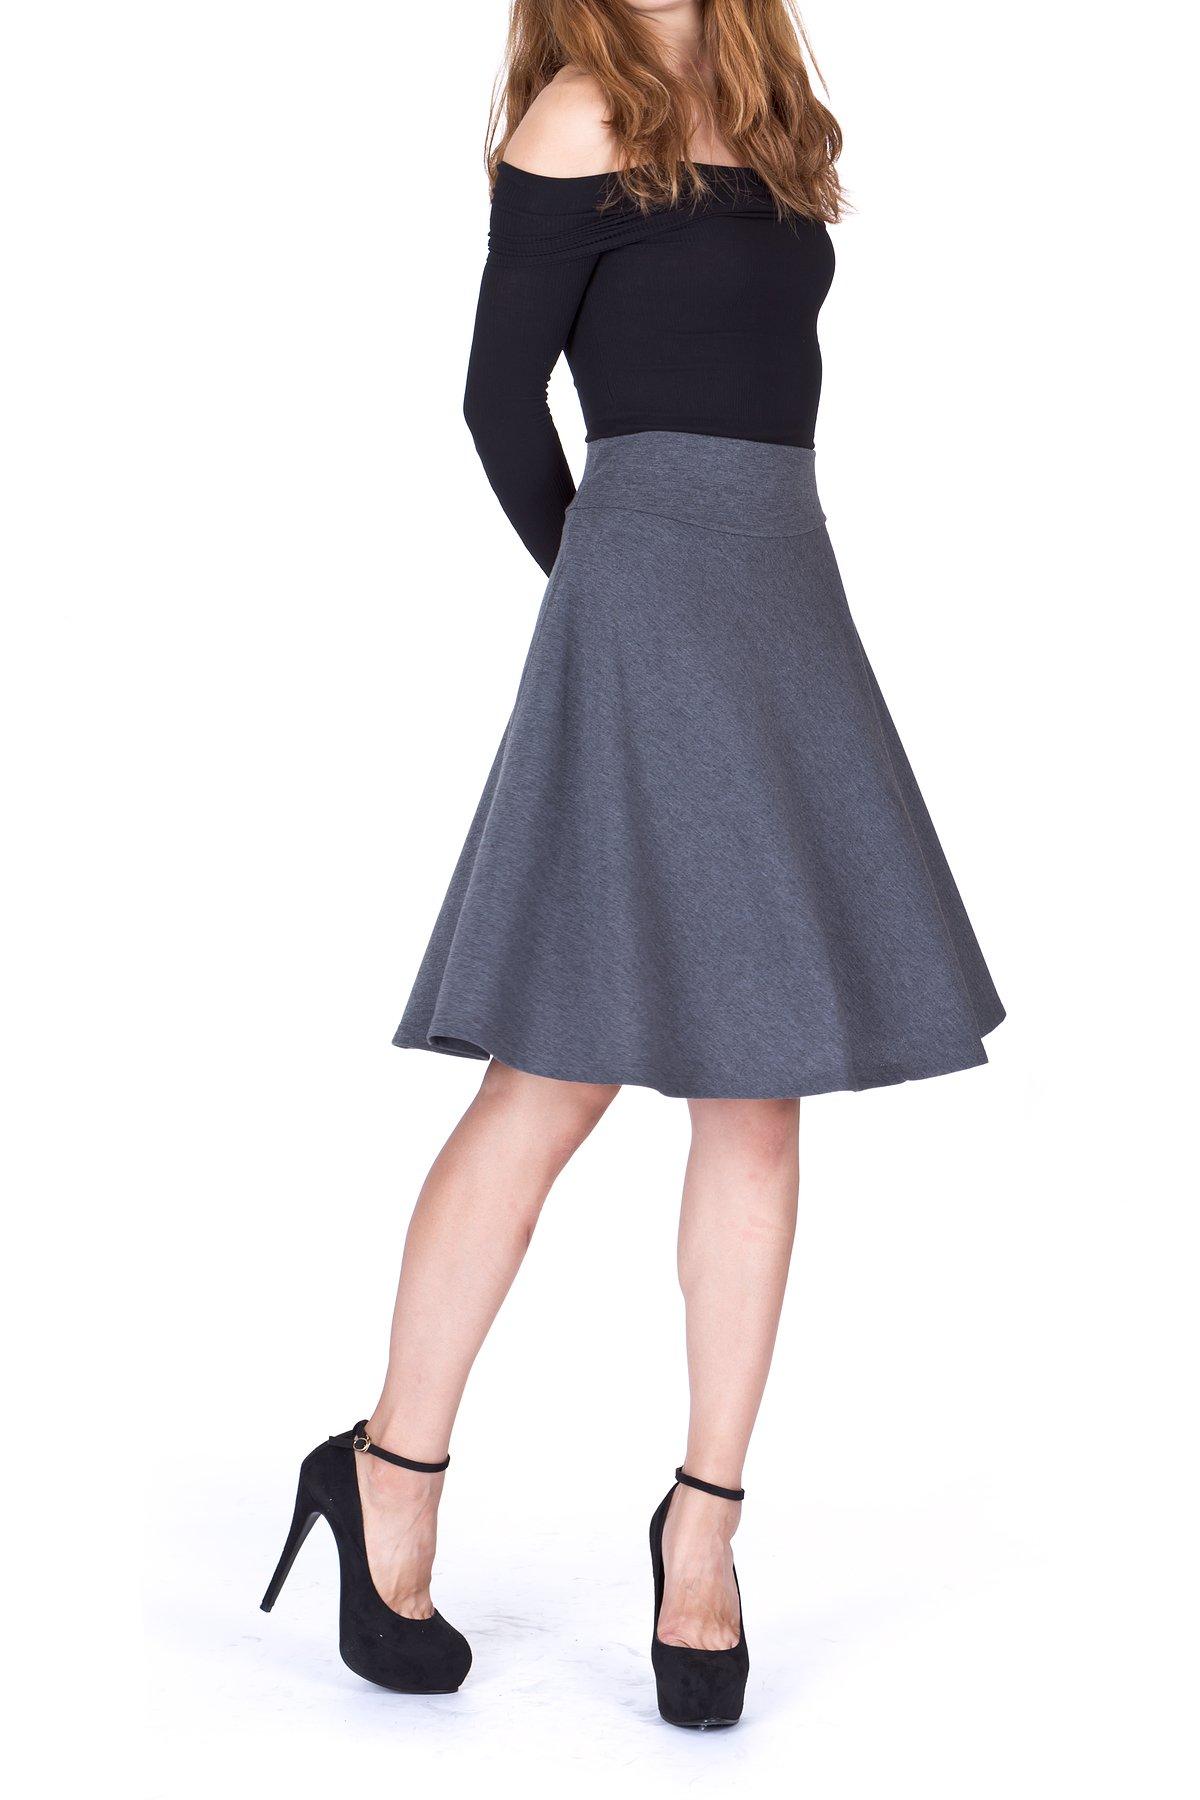 Dani's Choice Impeccable Elastic High Waist A-Line Full Flared Swing Skater Knee Length Skirt (M, Charcoal)